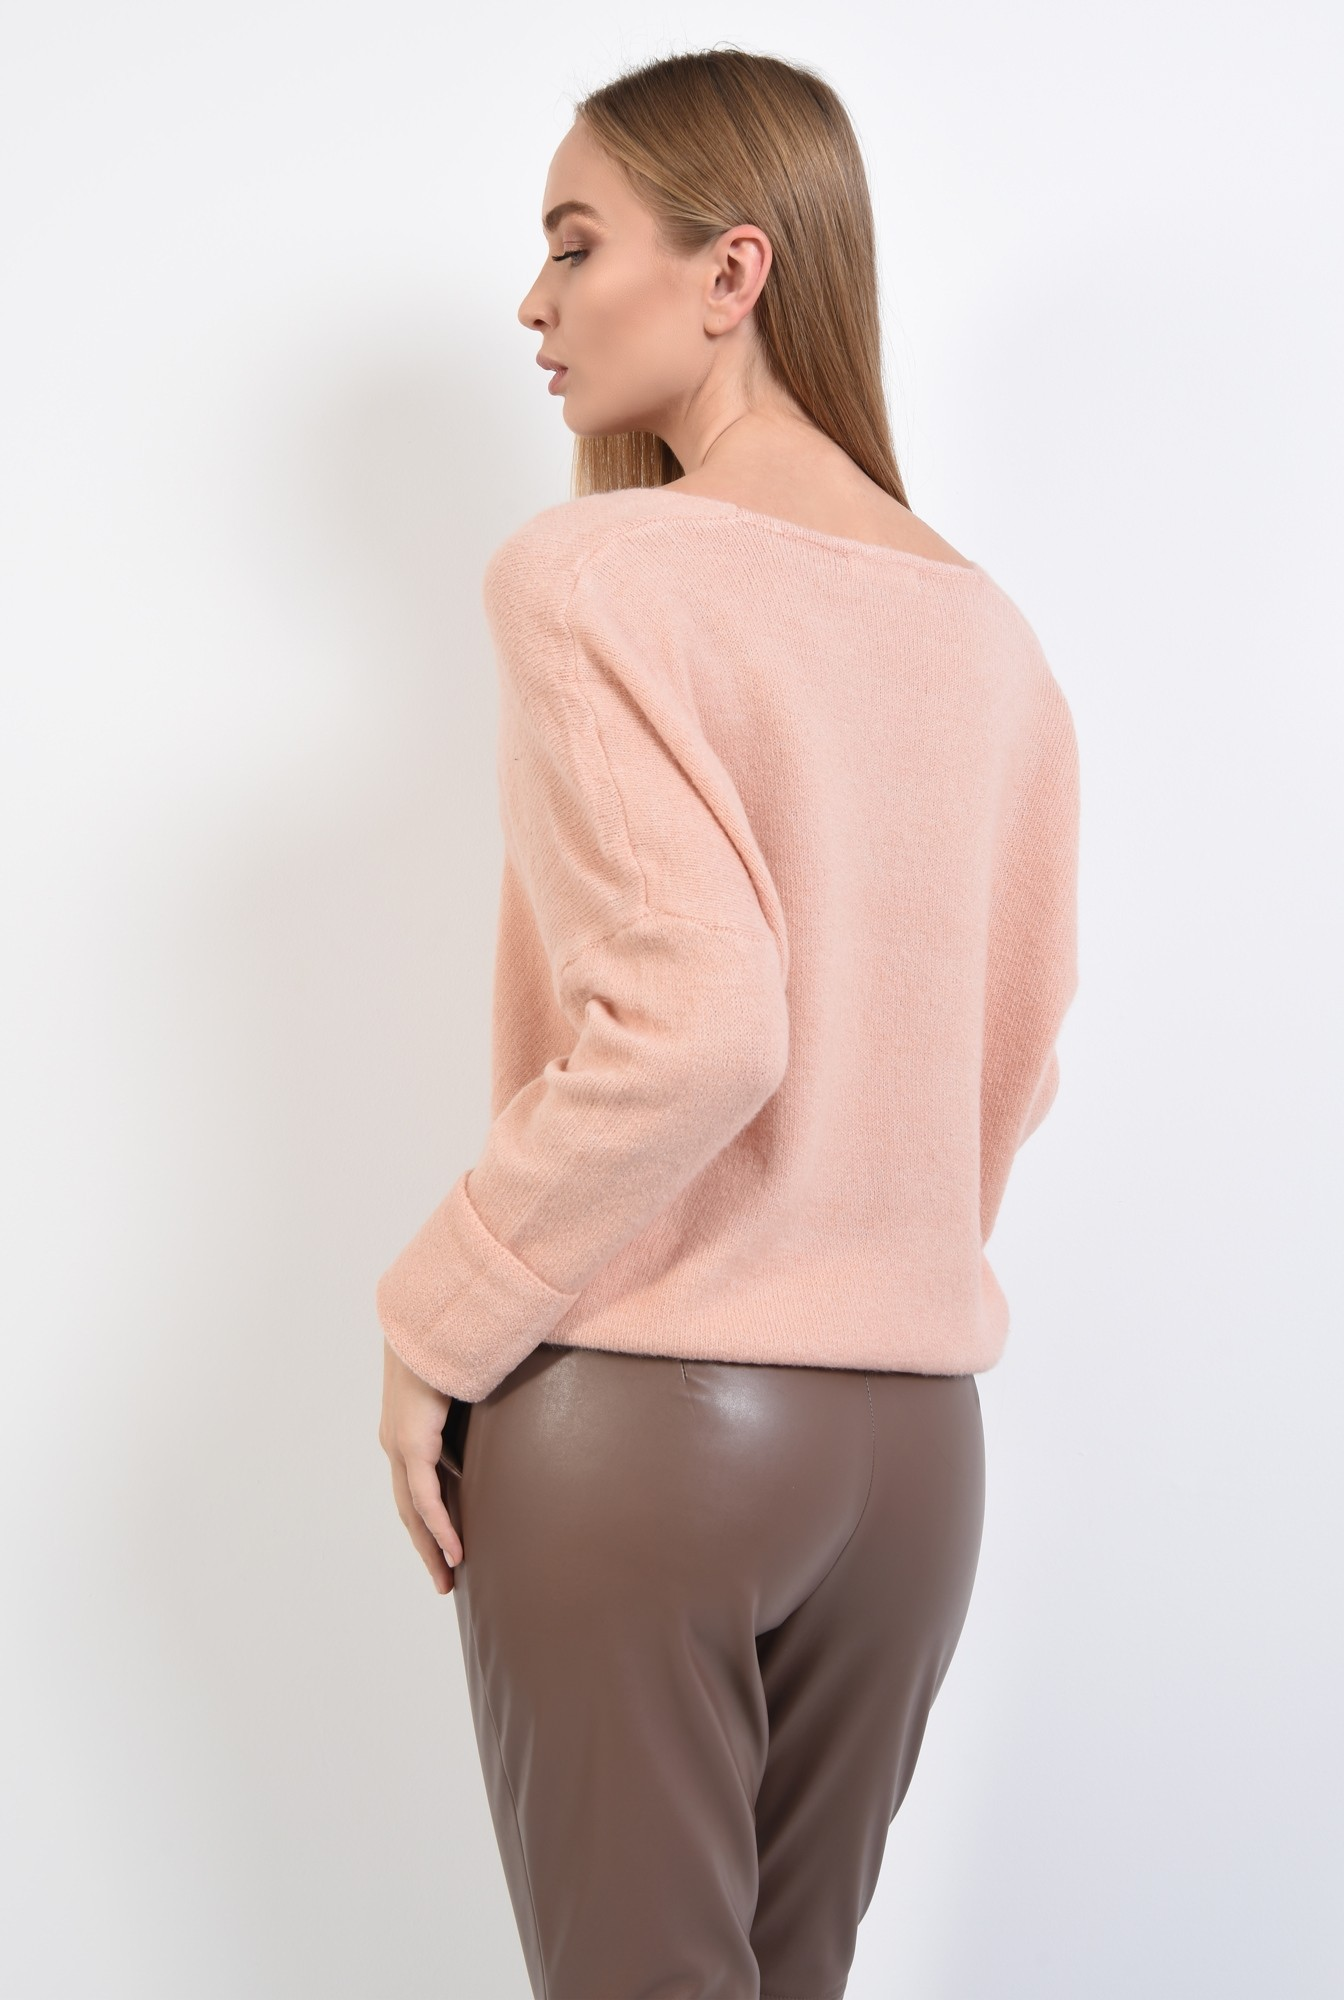 1 - 360 - pulover dama, online, tricotaje, roz, bordura reiata